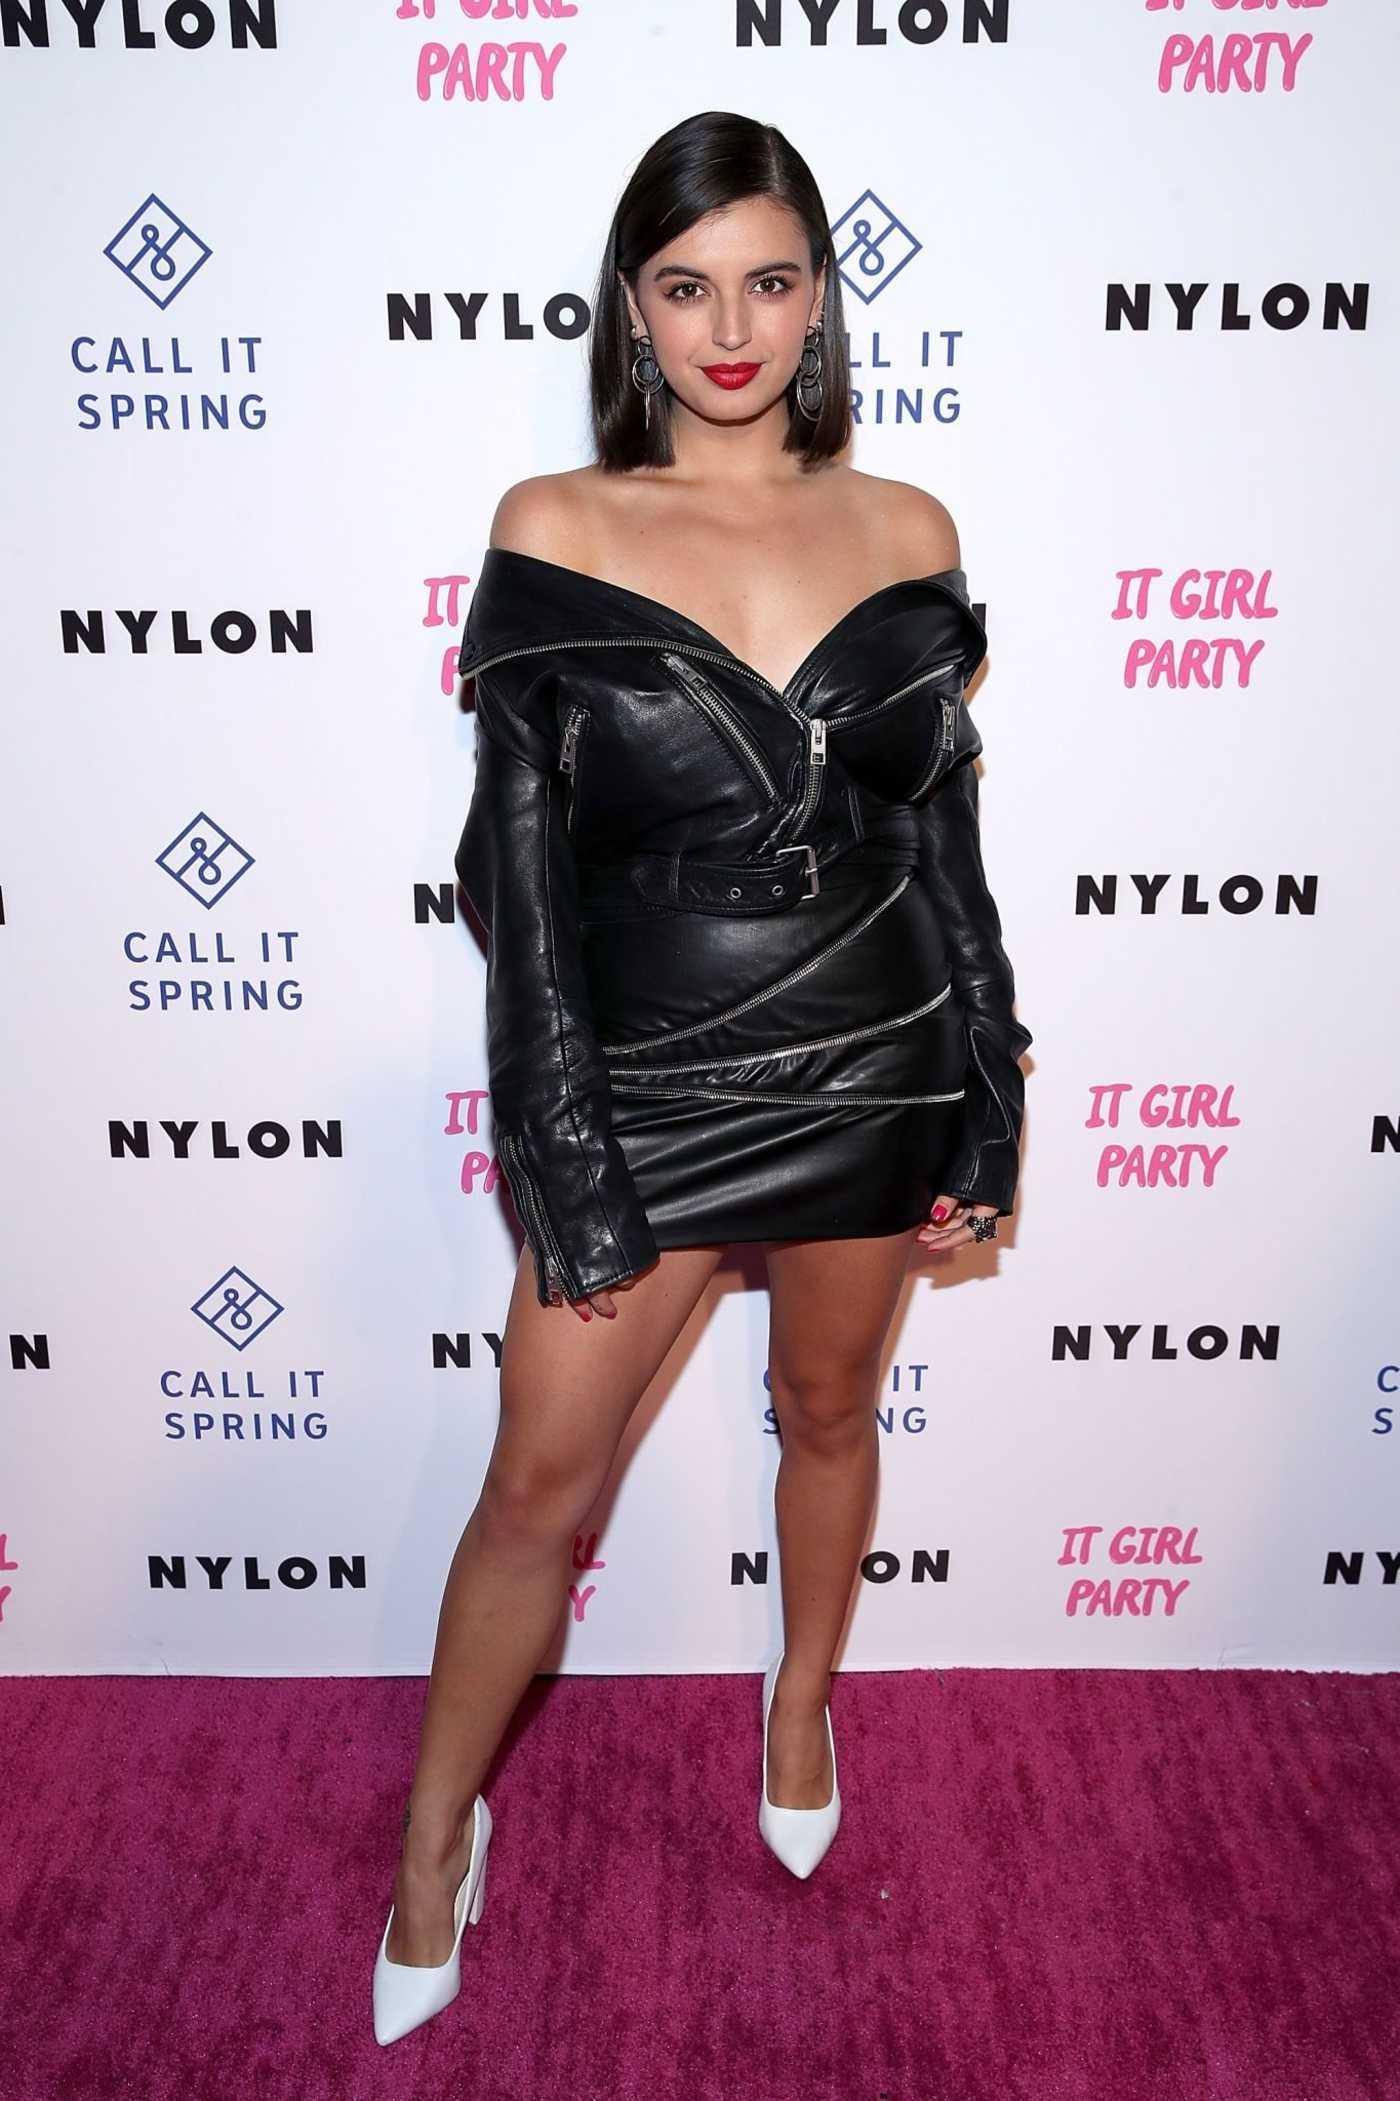 Rebecca Black Attends NYLON's Annual It Girl Party at The Ace Hotel in LA 10/11/2018